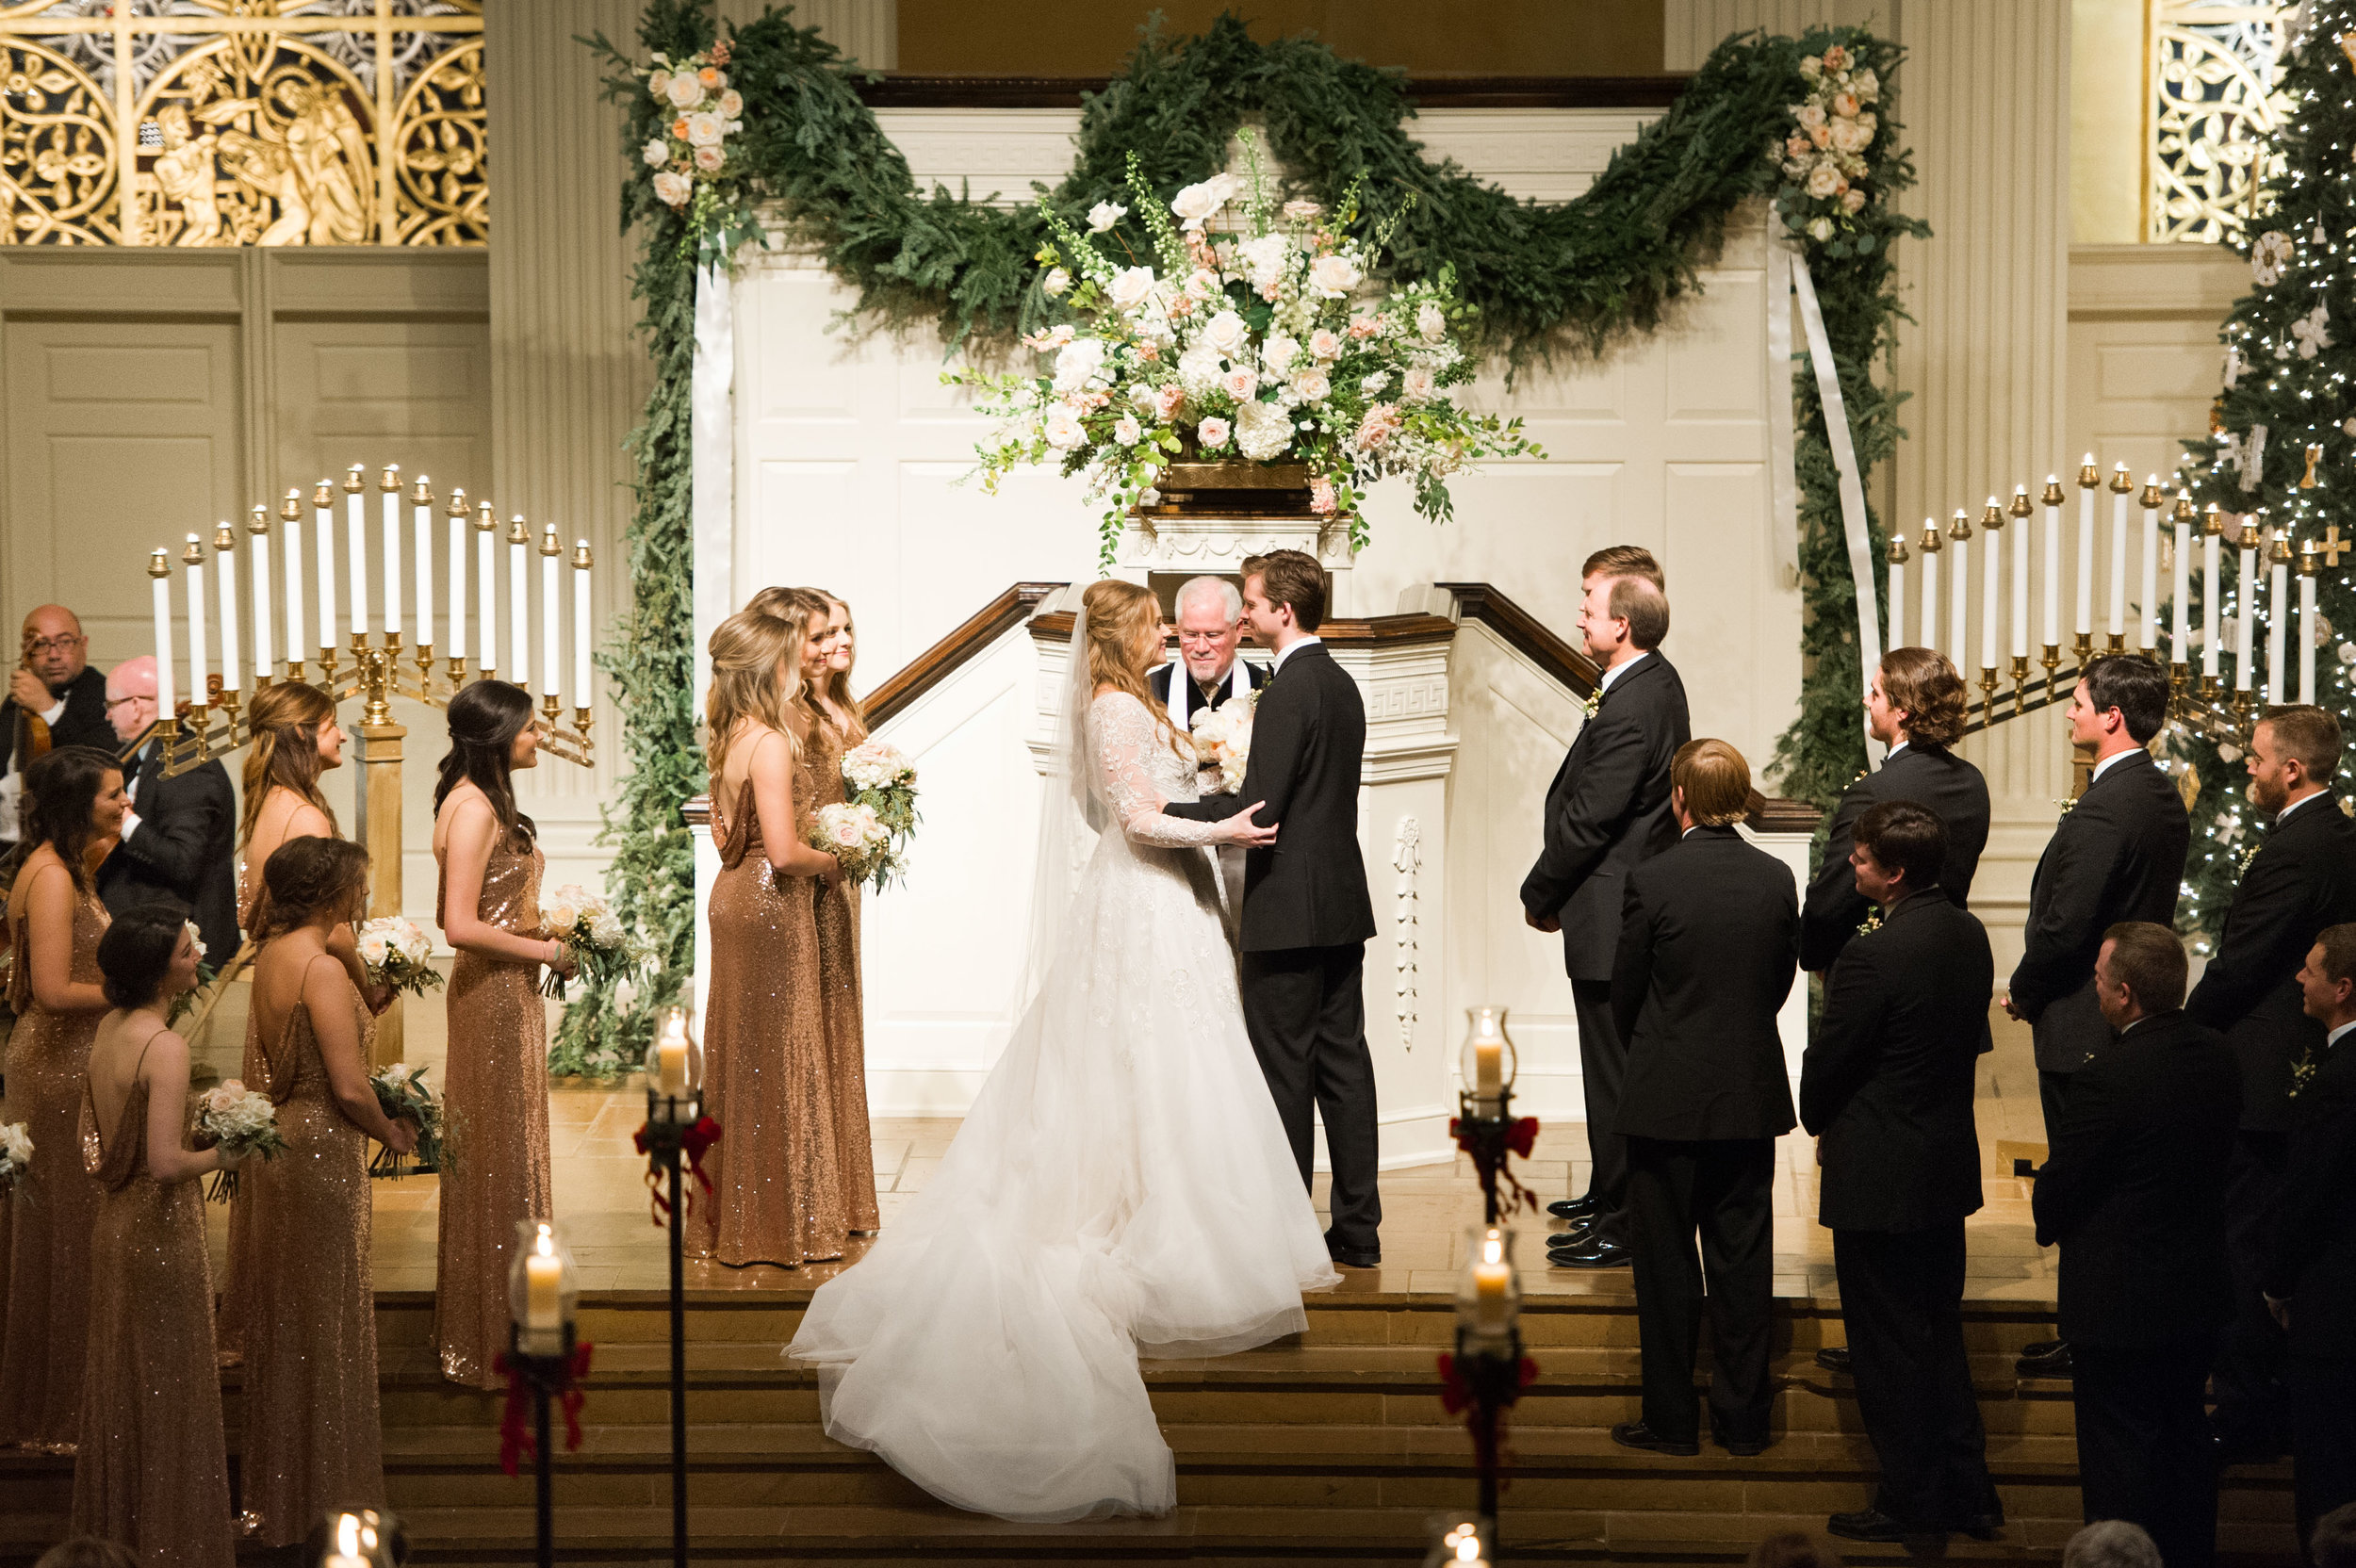 Handley Breaux Designs | Southern Wedding, Southern Wedding Planner, Southern Bride, Alabama Bride, Alabama Wedding, Alabama Wedding Planner, Birmingham Bride, Birmingham Wedding Planner, Birmingham Wedding, Winter Wedding, Winter Bride